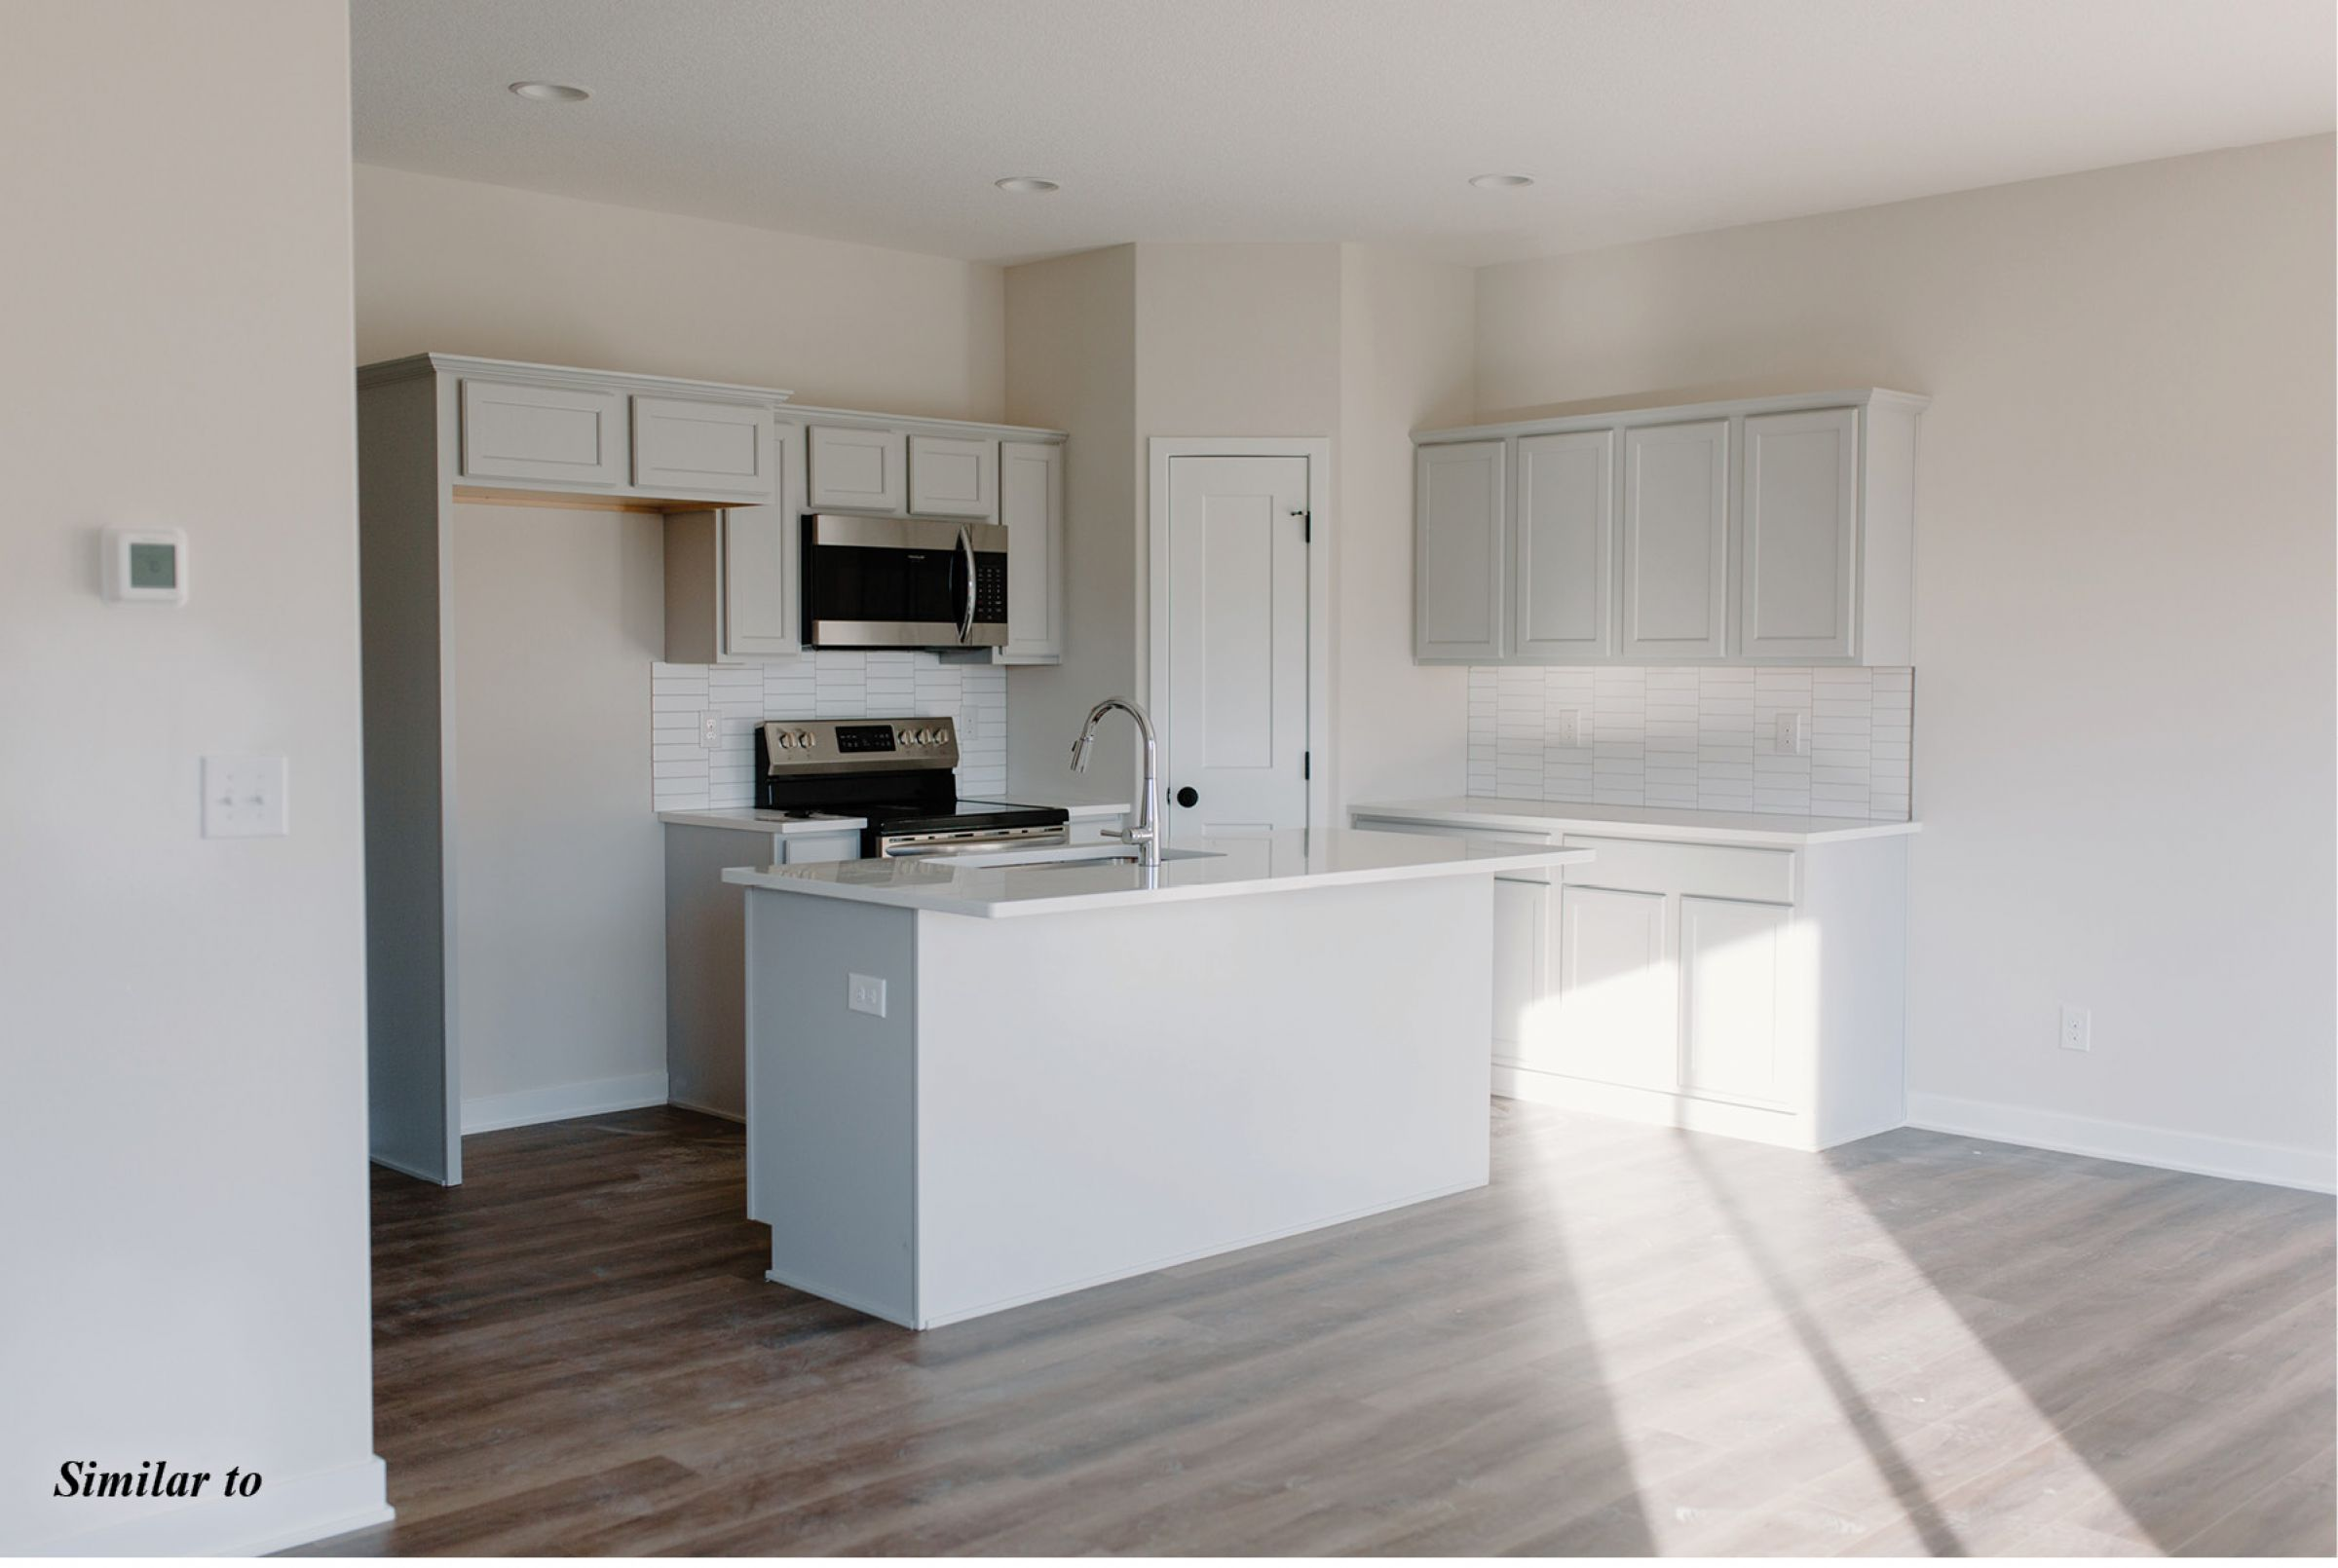 residential-warren-county-iowa-0-acres-listing-number-15674-1-2021-08-06-135346.jpg